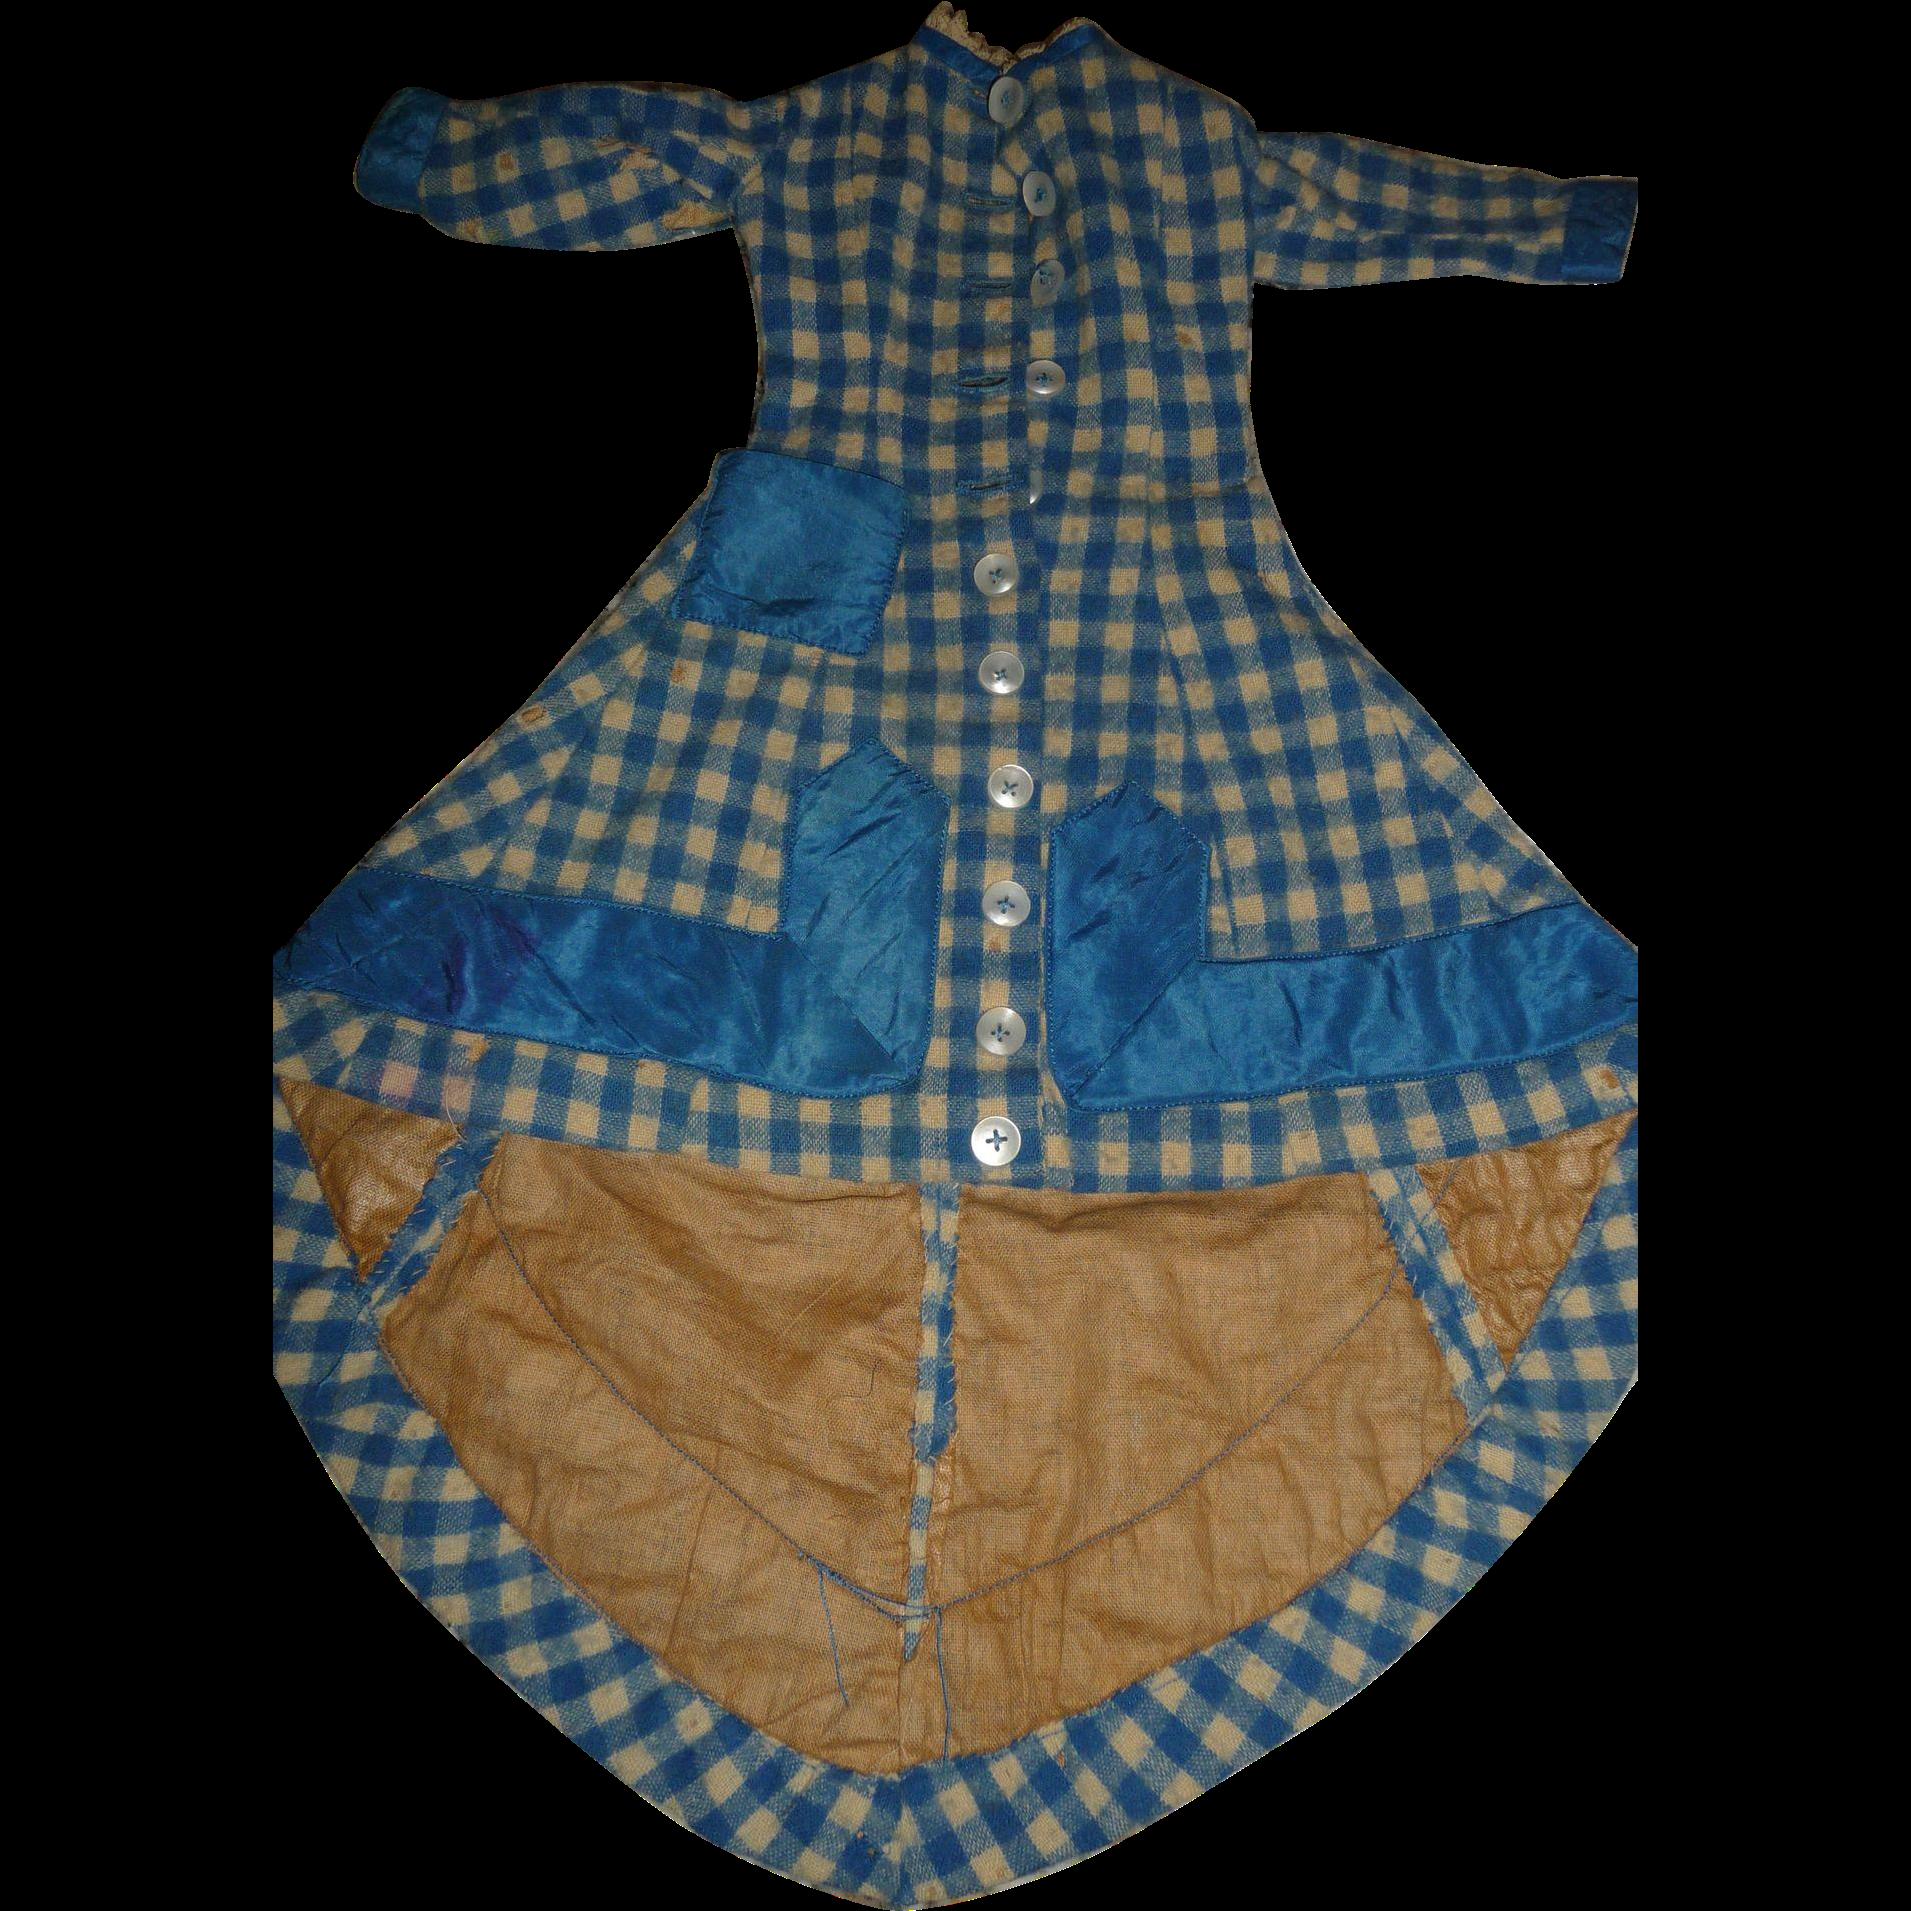 Antique original wool german or french fashion doll dress